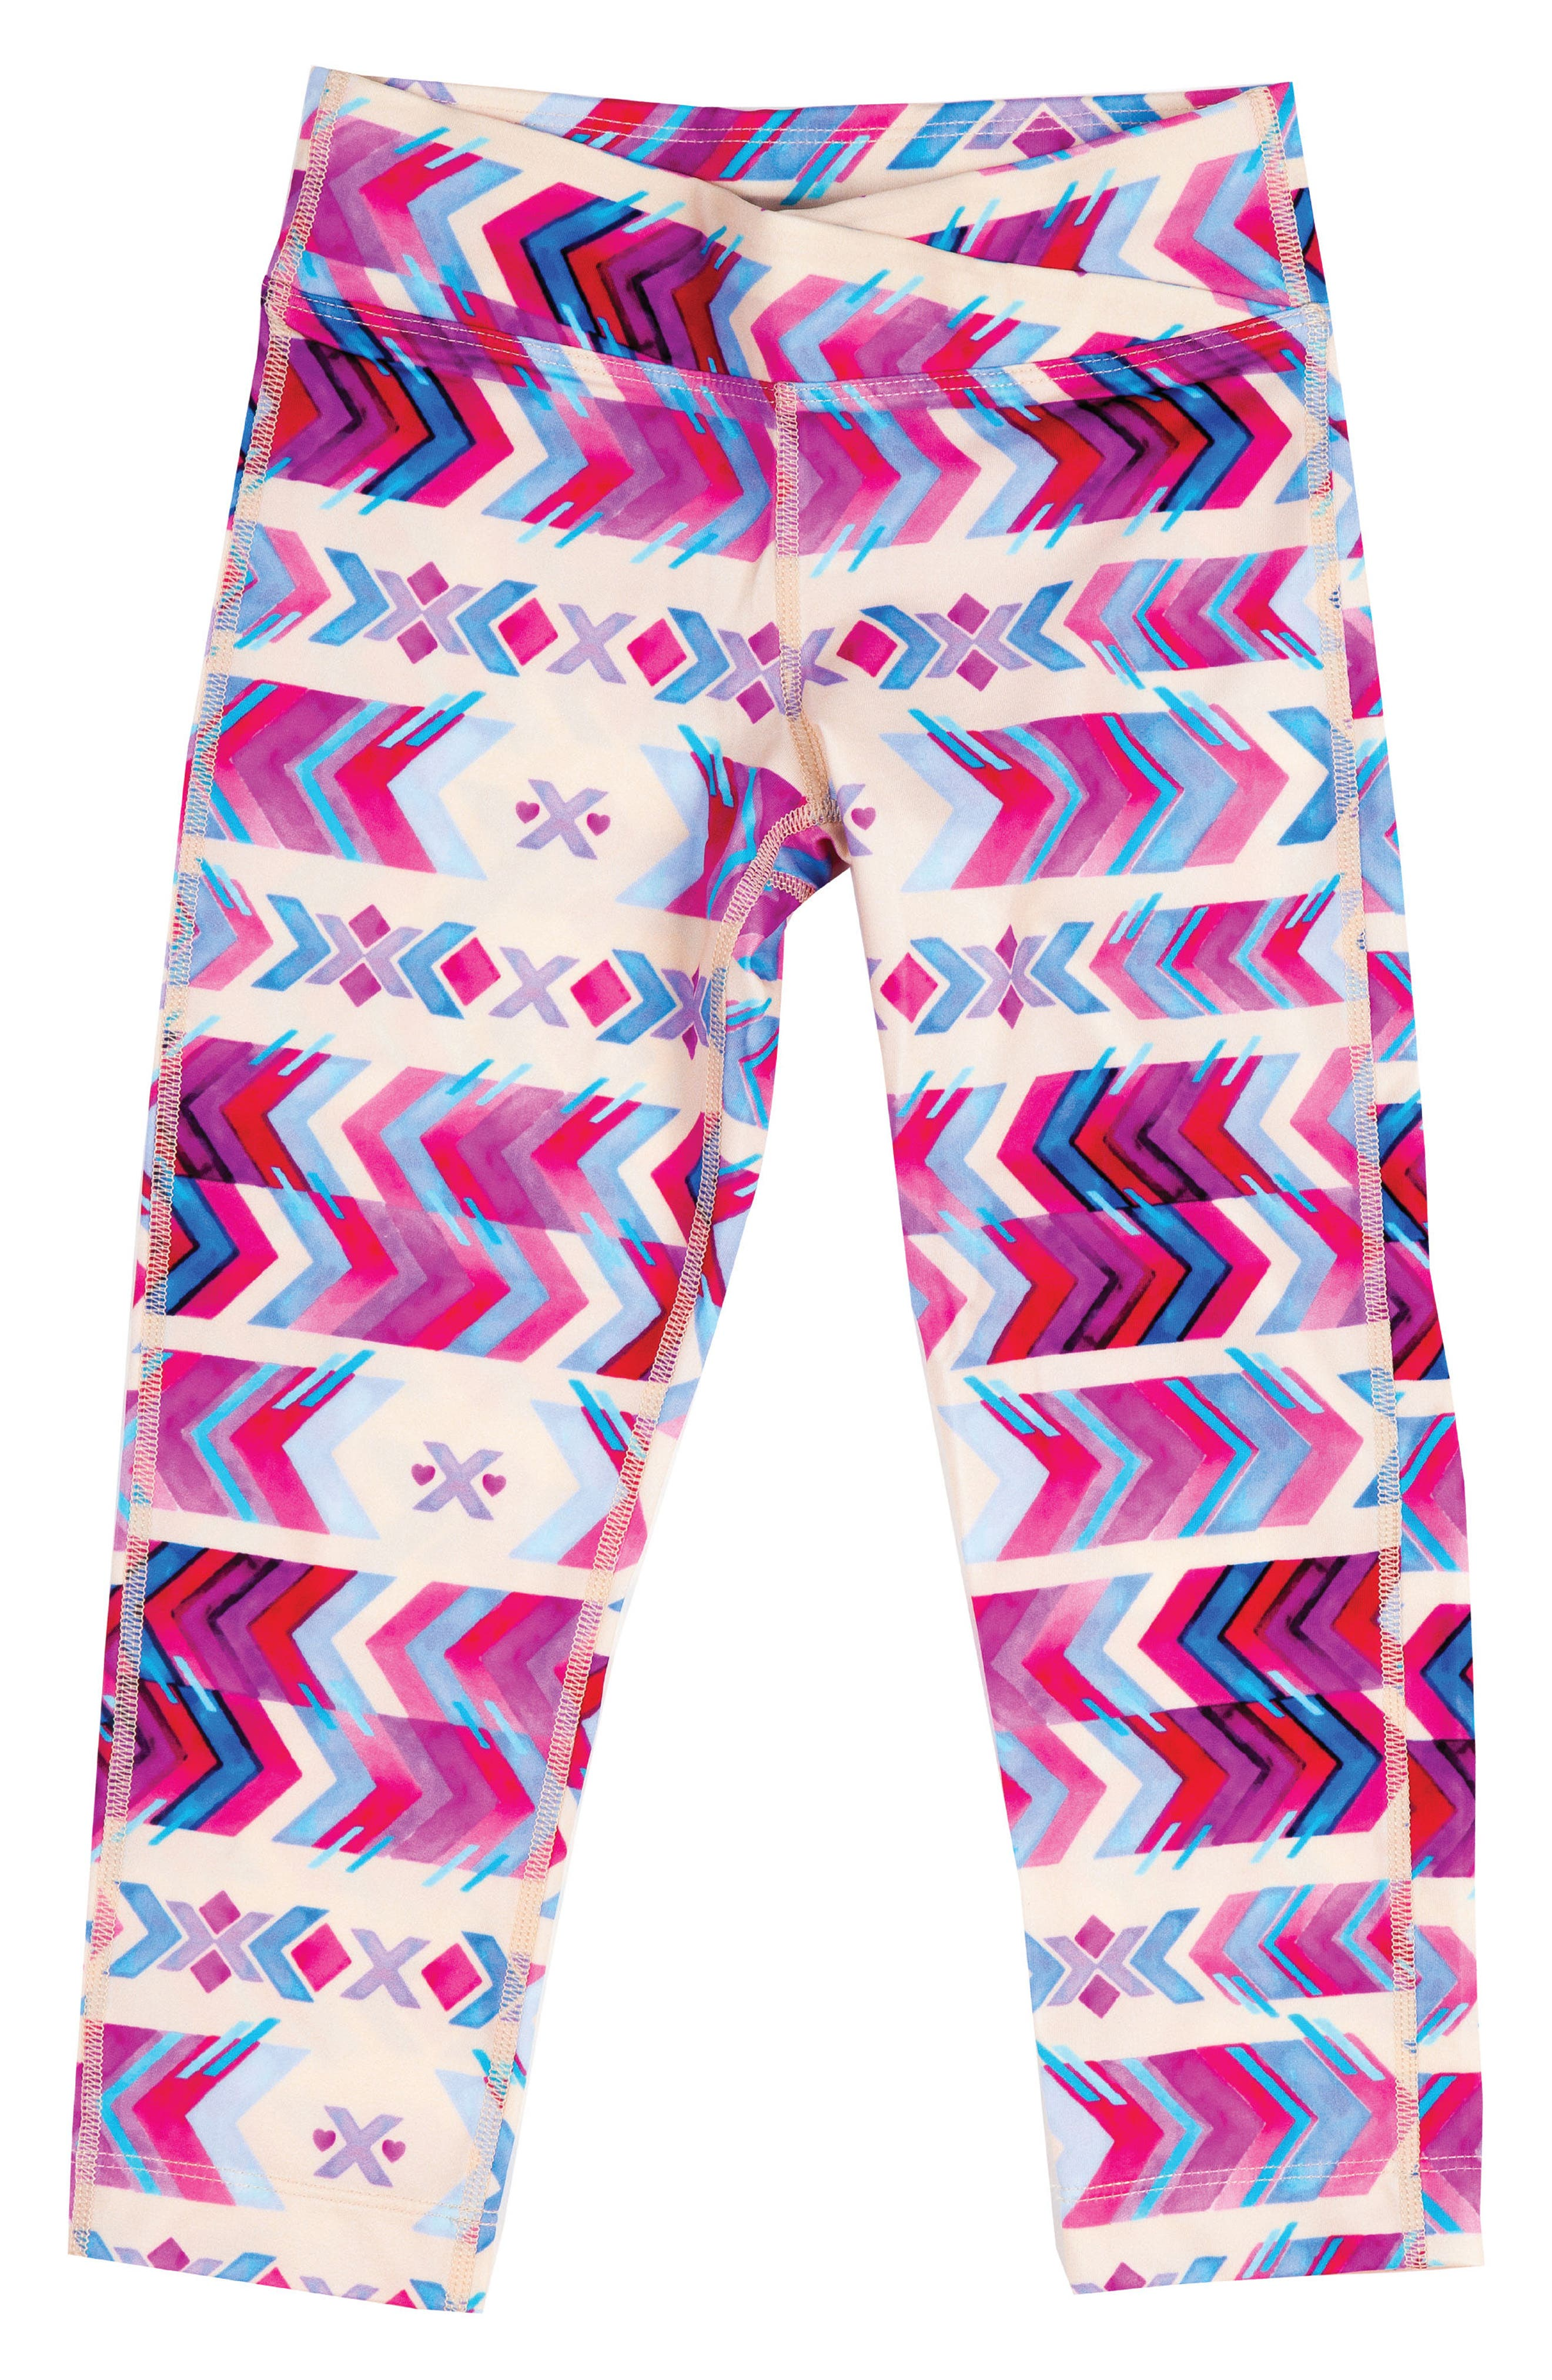 Alternate Image 1 Selected - BOWIE X JAMES Surf's Up Swim Leggings (Toddler Girls, Little Girls & Big Girls)